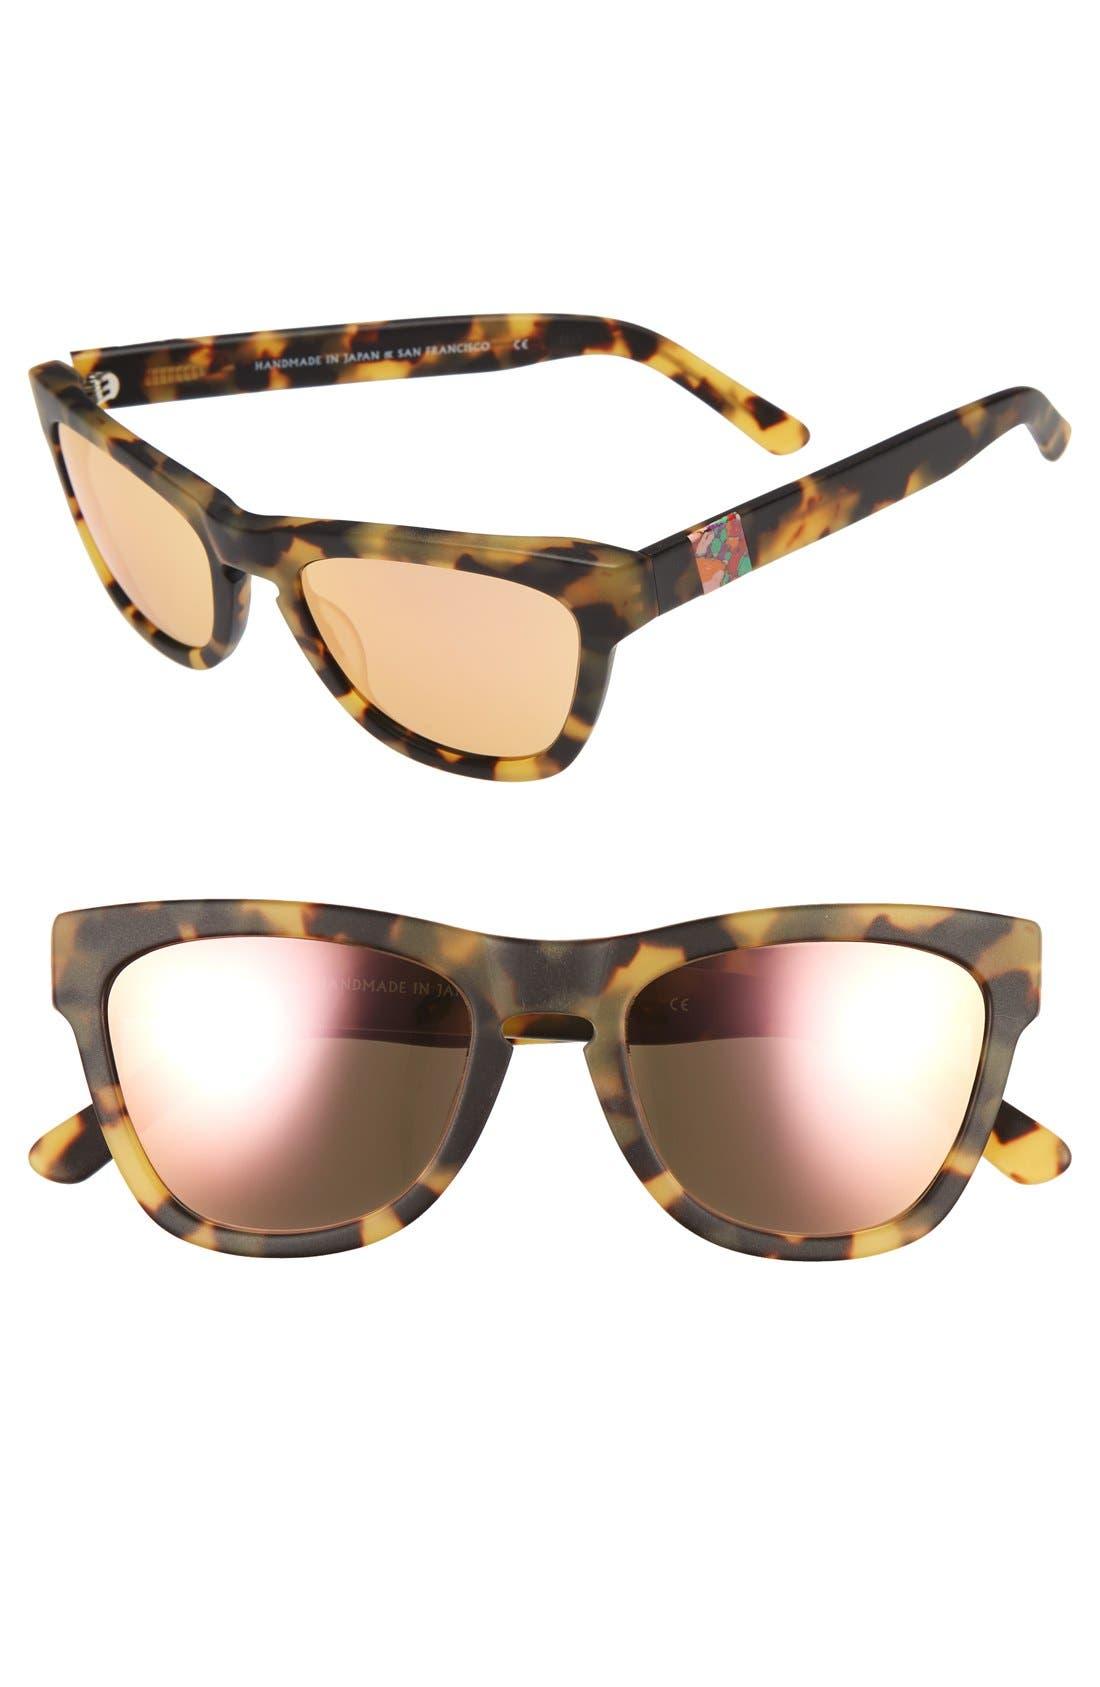 Olivia Palermo x Westward Leaning 'Pioneer' 53mm Sunglasses